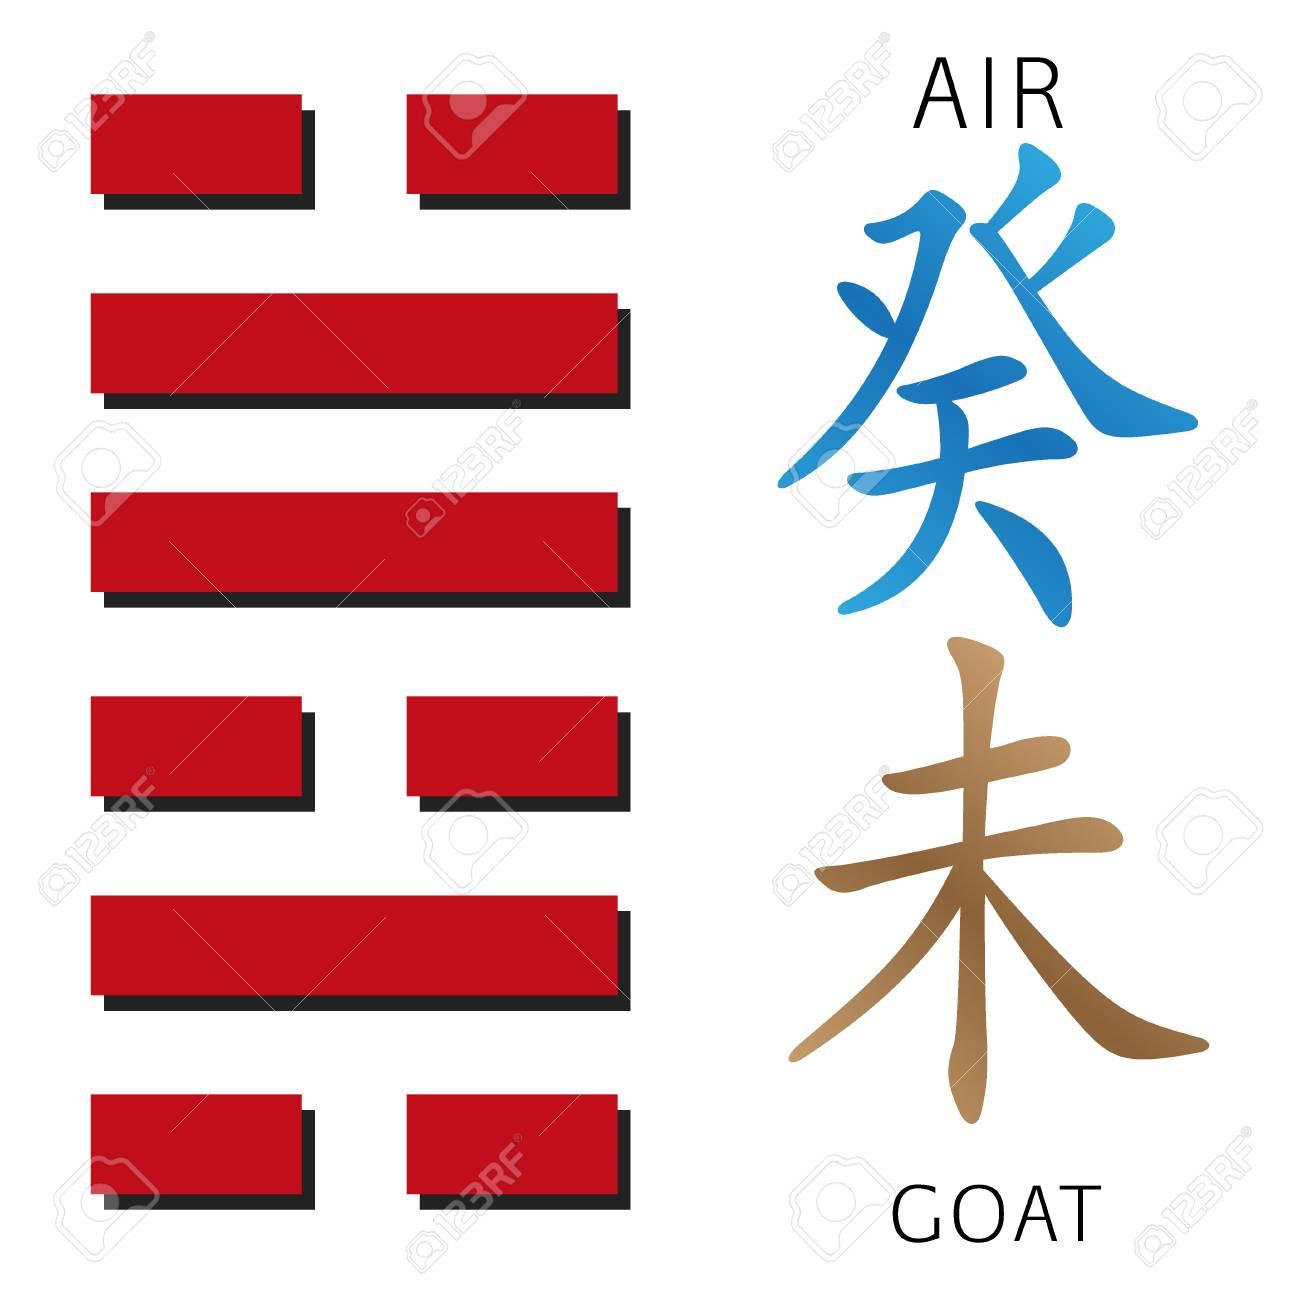 Symbol Of I Ching Hexagram From Chinese Hieroglyphs Translation Of